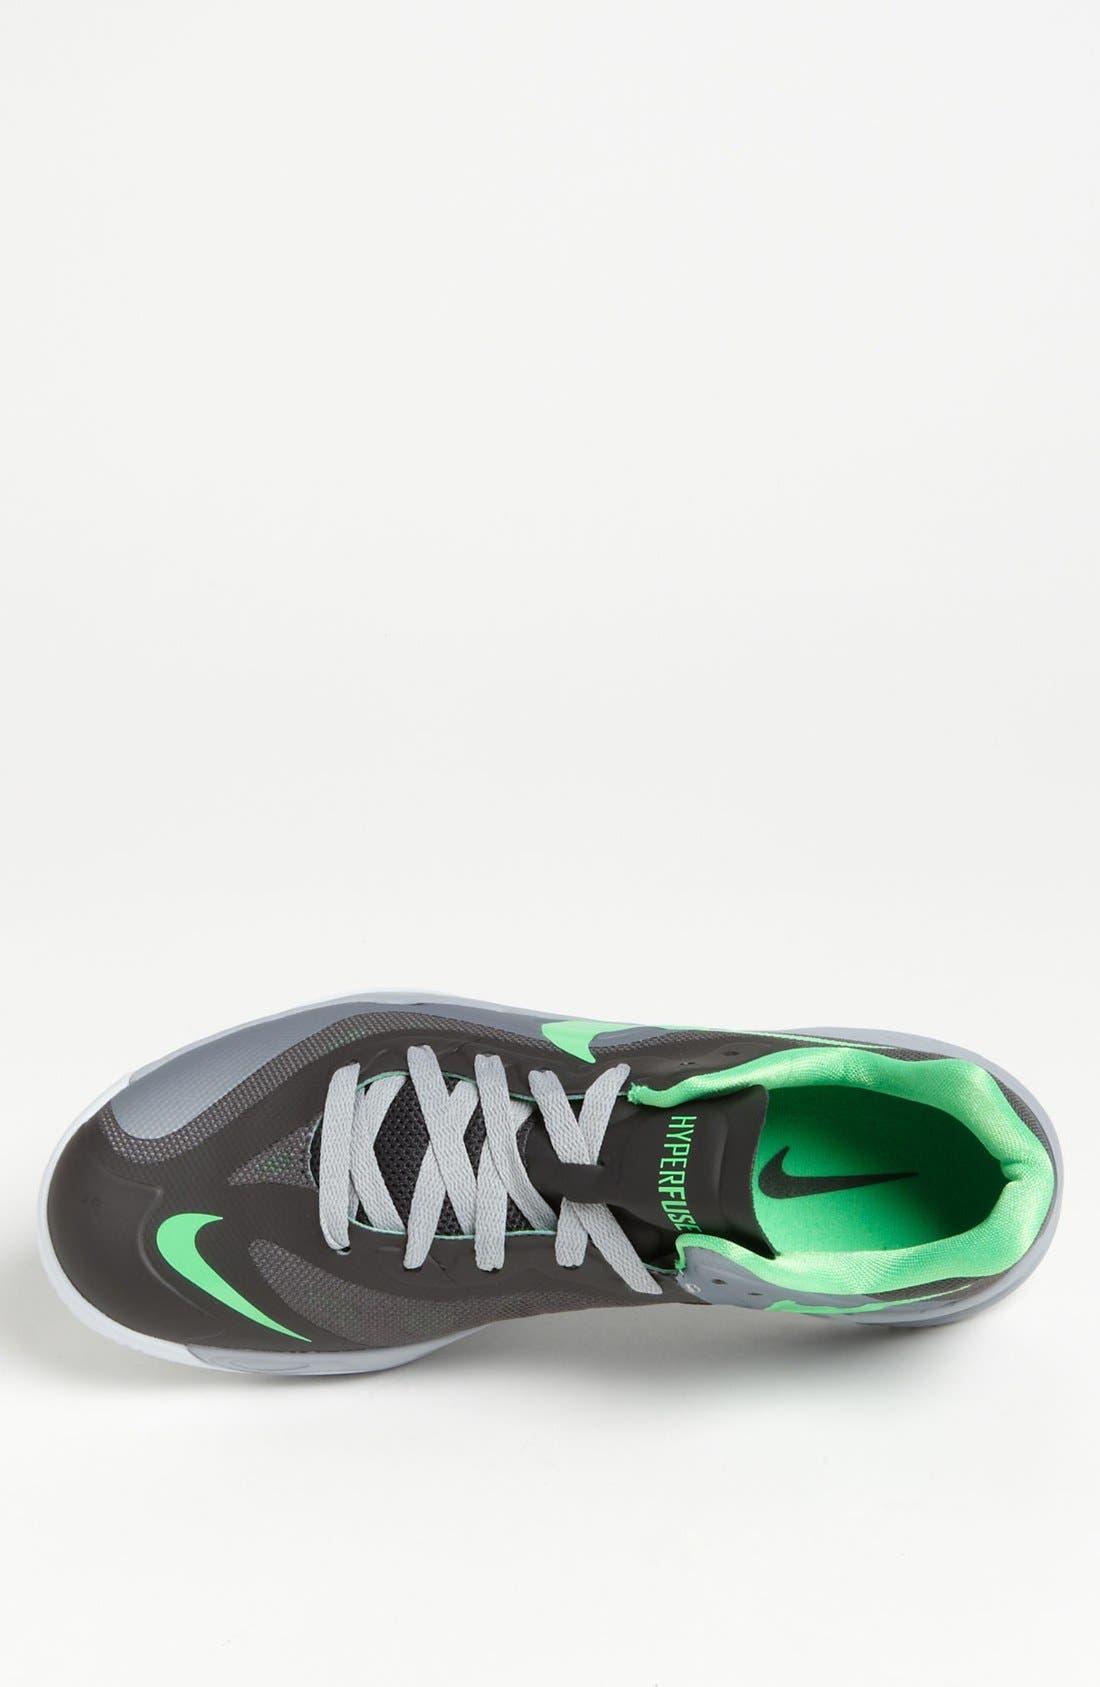 NIKE,                             'Hyperfuse Low' Basketball Shoe,                             Alternate thumbnail 4, color,                             004